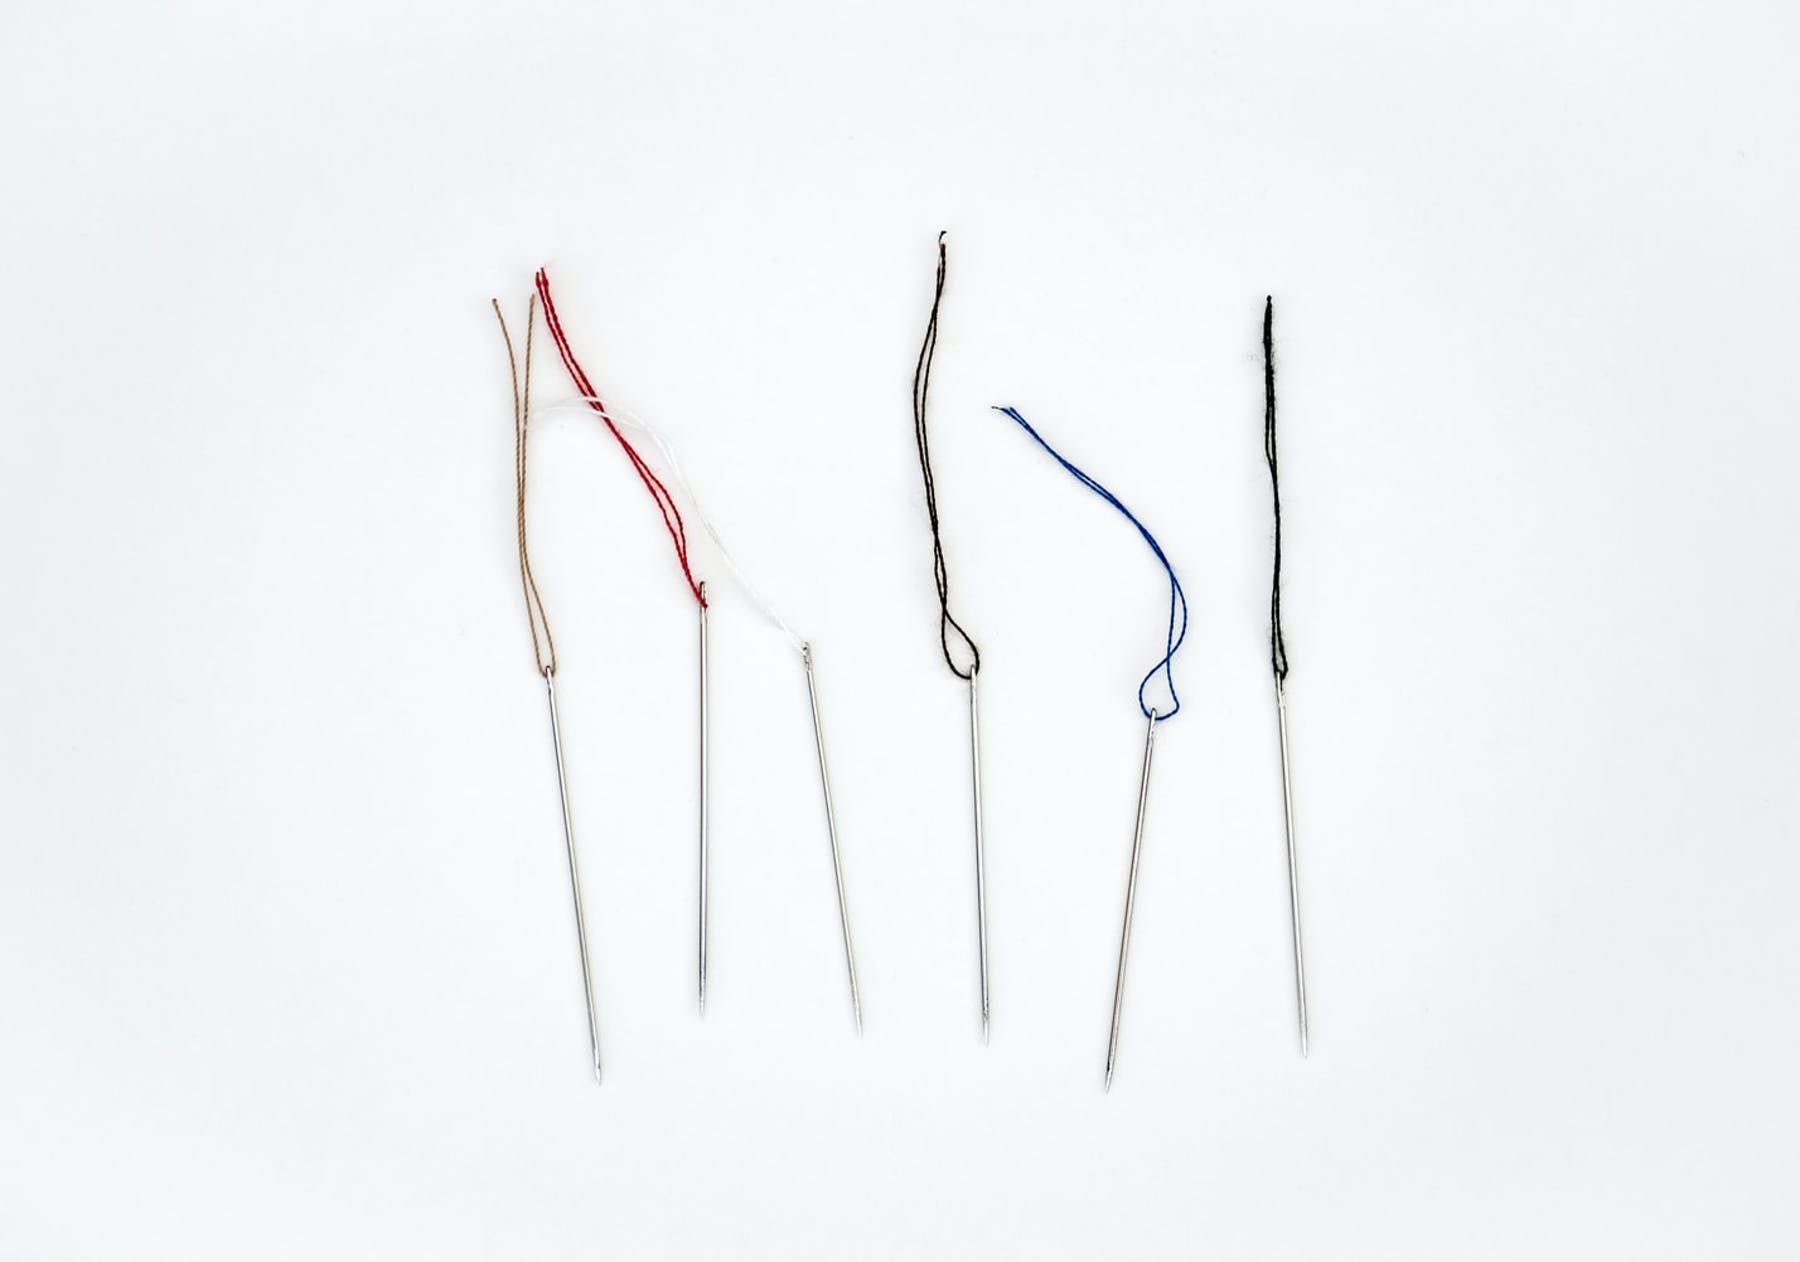 needles with thread